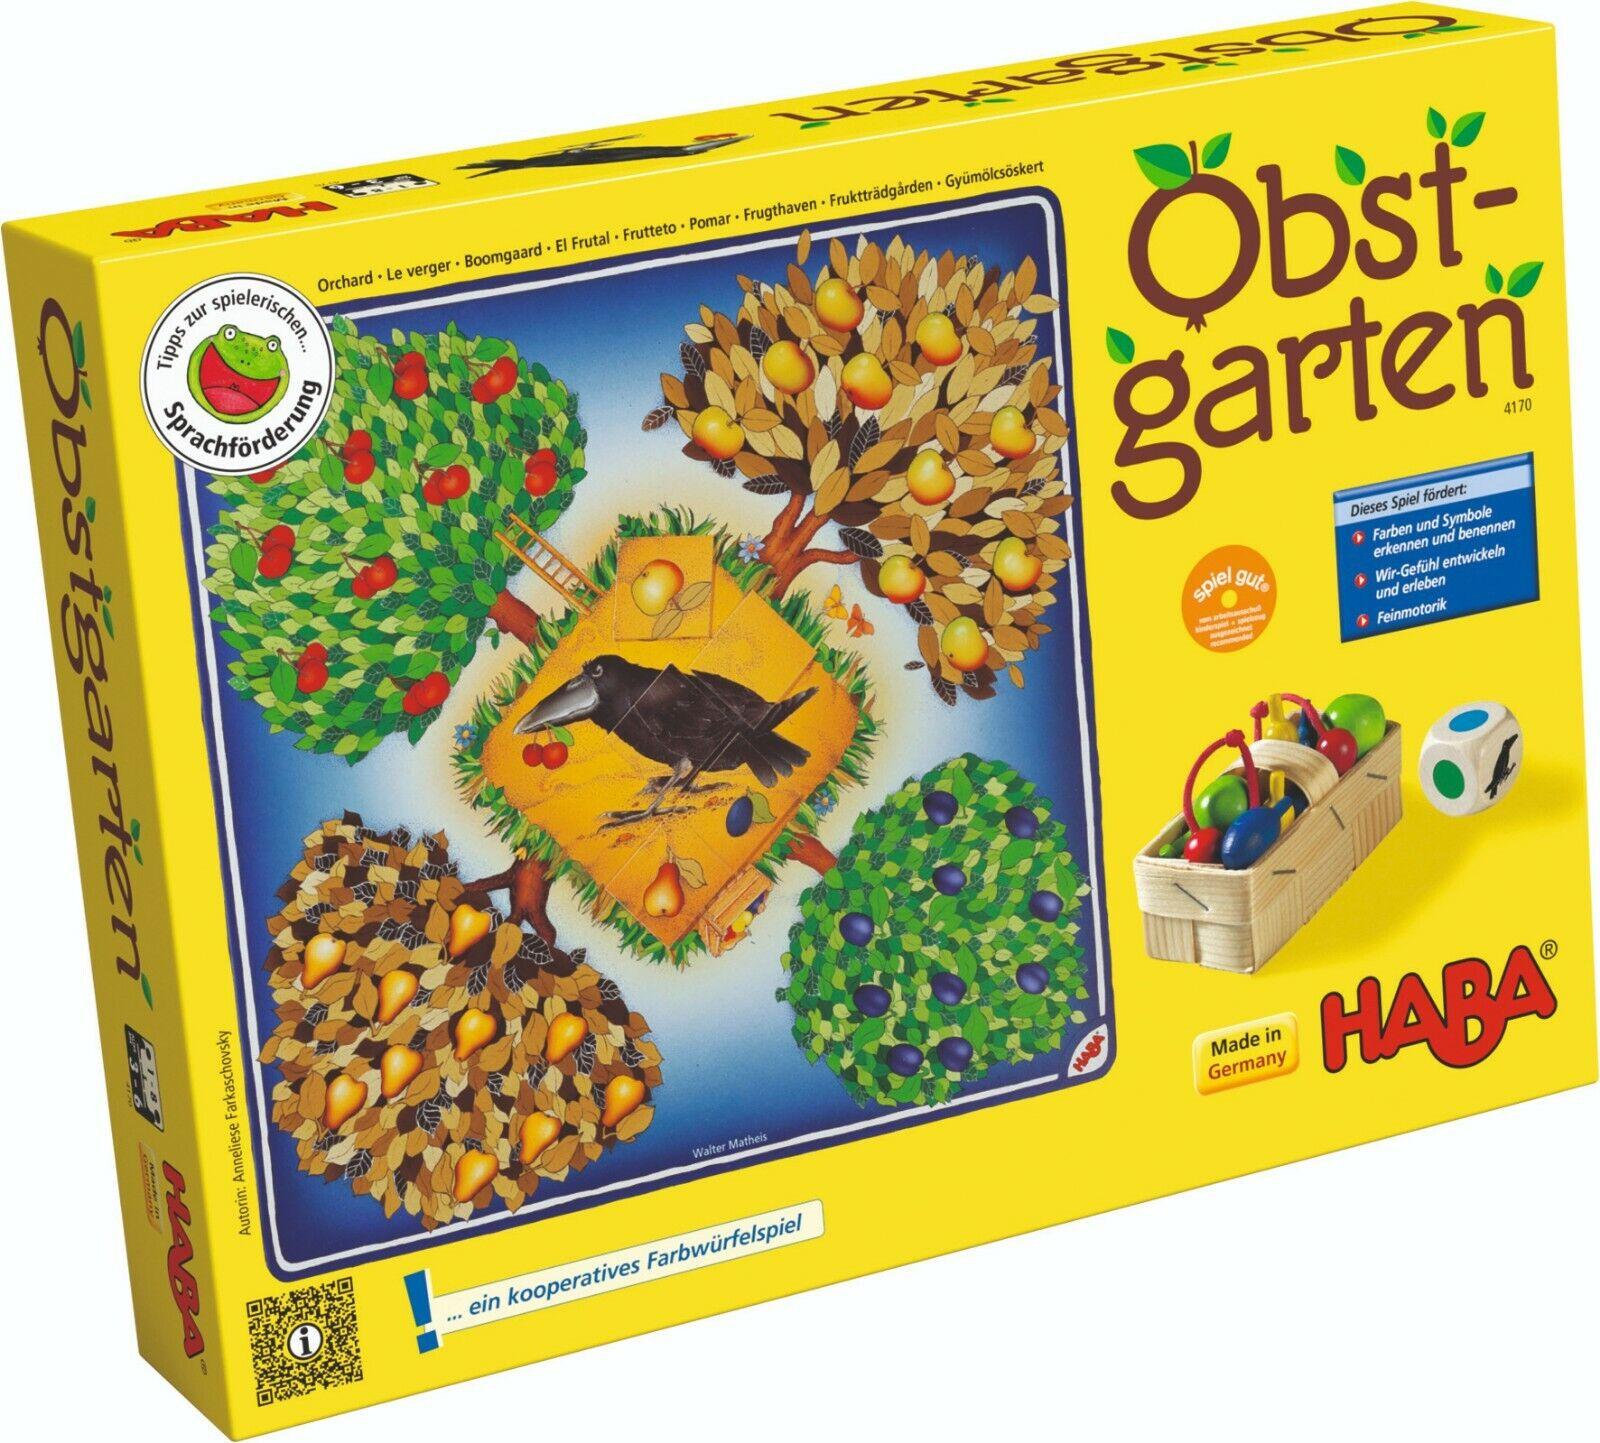 Haba Fruit Orchard 4170 Cooperative Game Farben-Lernspiel